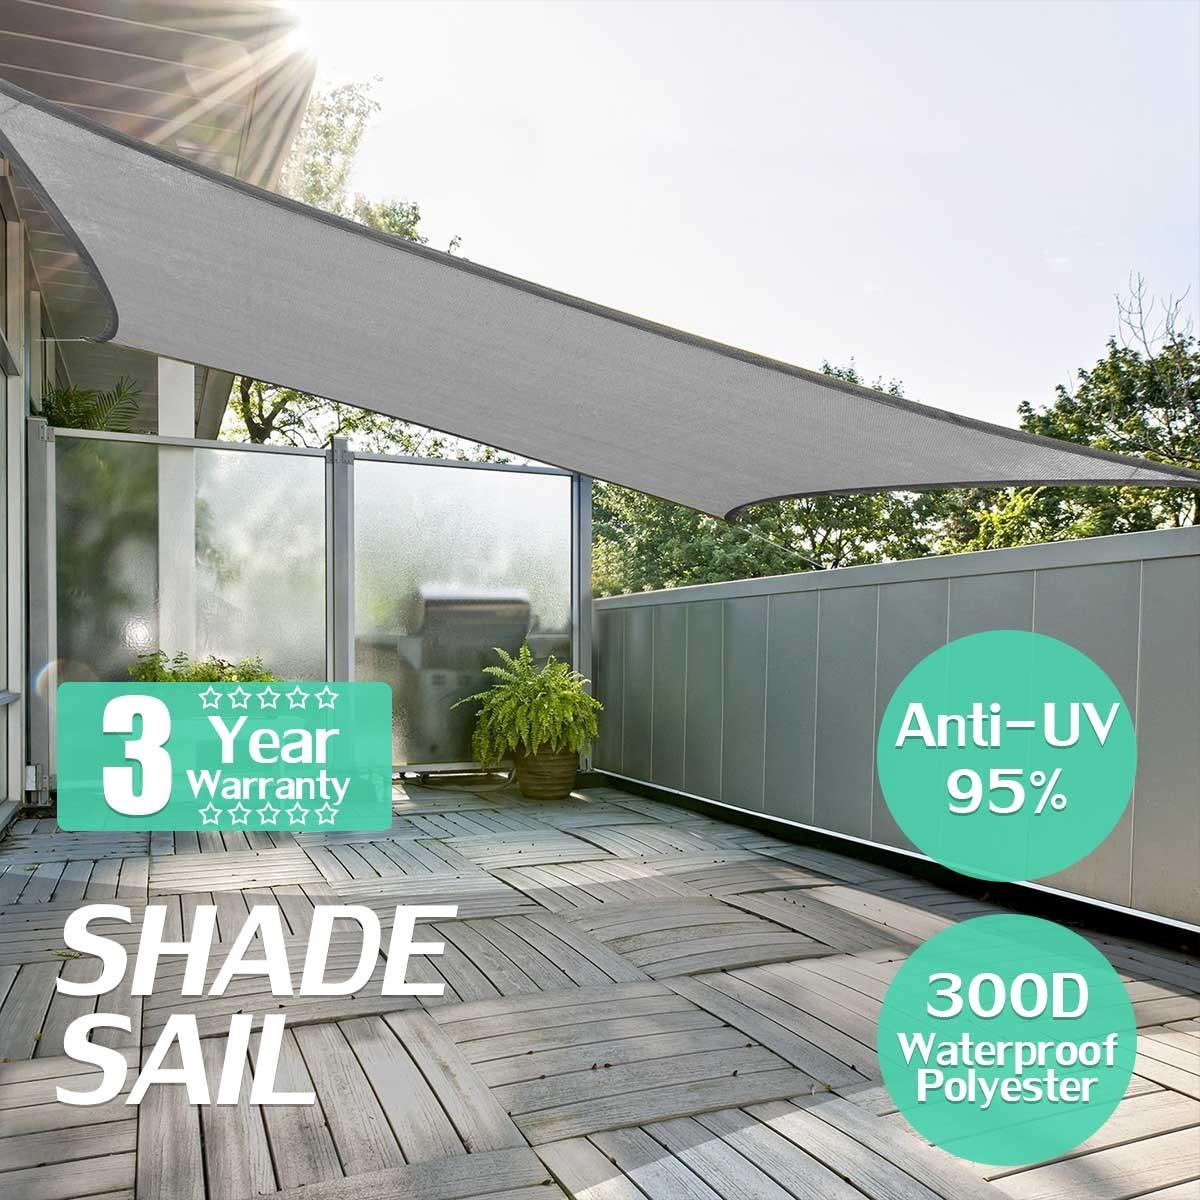 Grey Square 3x3/4x4m Retractable Sun Shade Shelter 160GSM HDPE Farbic Garden Awning Canopy Sunshade цены онлайн